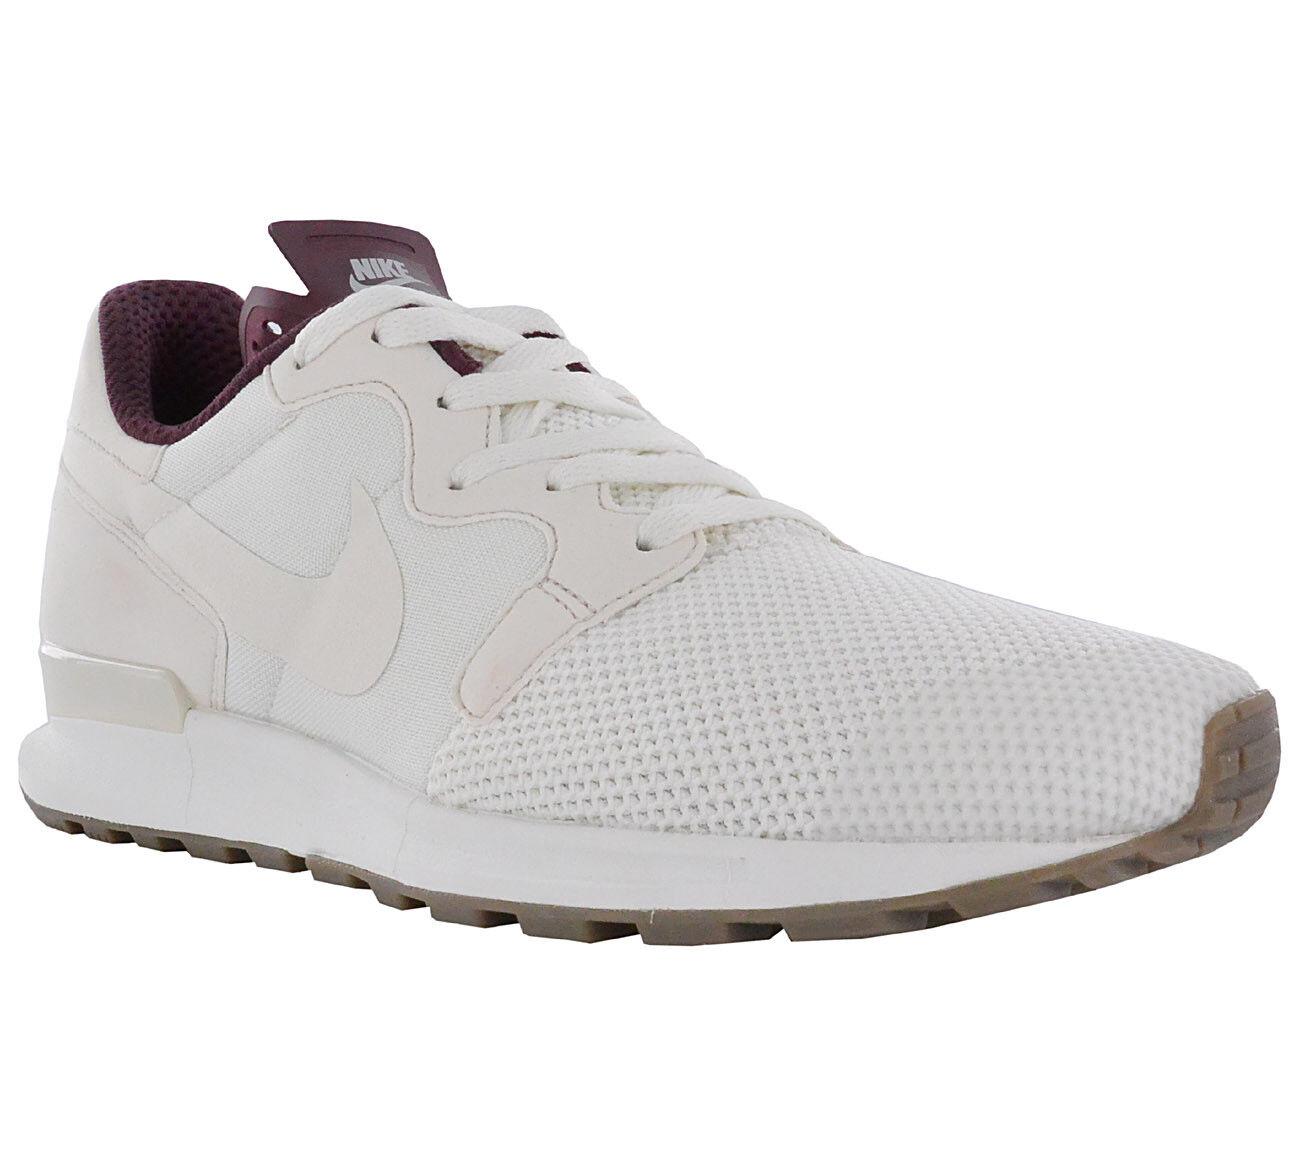 NEW Nike Air Berwuda Prm 844978-005 Men''s shoes Trainers Sneakers SALE